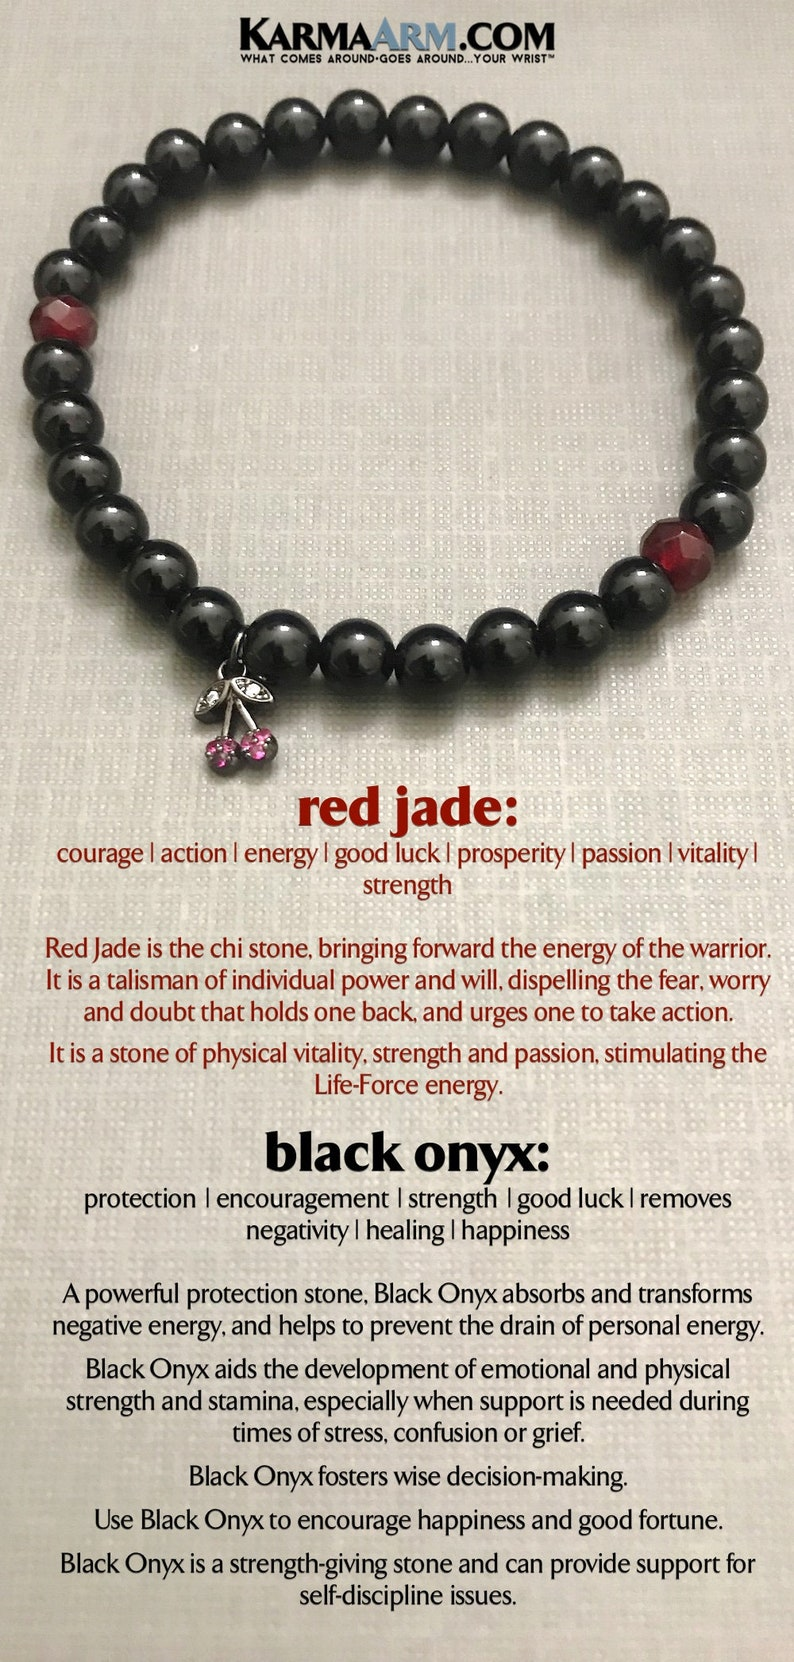 Beaded Bracelets, Boho Bracelets, Reiki Healing Mens Bracelets, Womens  Jewelry Handmade in Hollywood, JOY: Black Onyx | Red Jade | Cherries